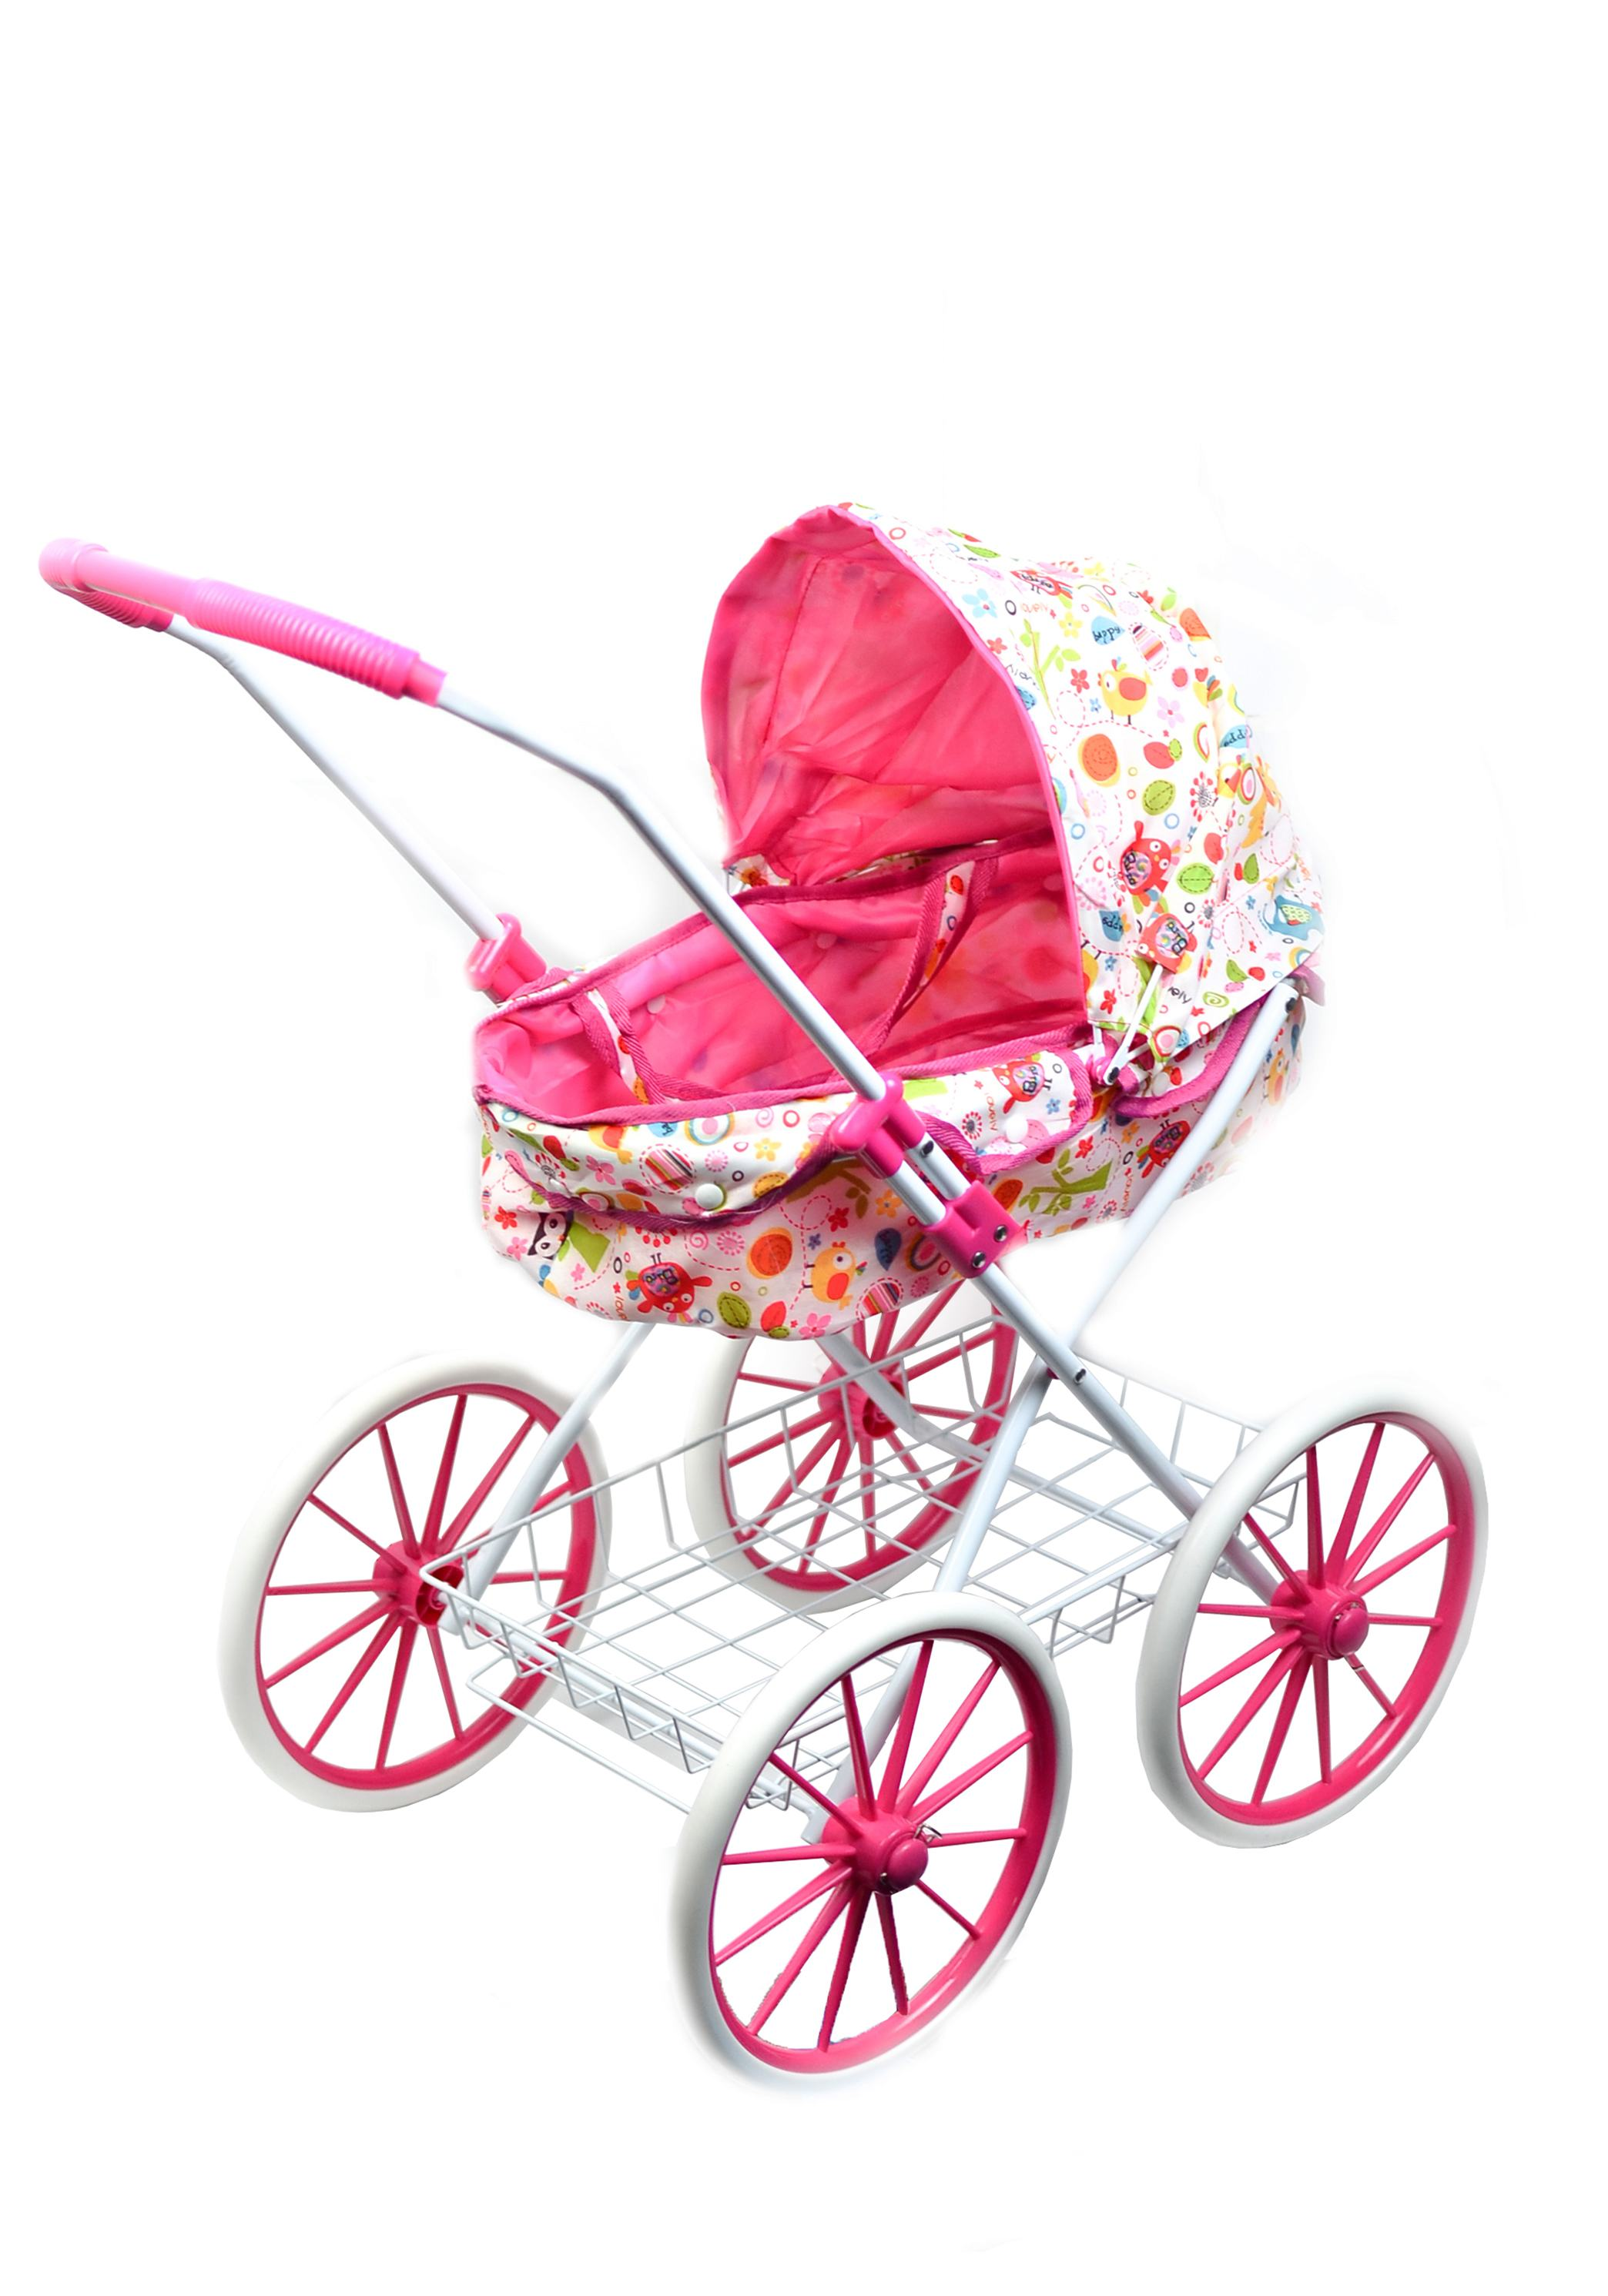 Carucior de jucarie pentru copii / Carucior papusi - 8826NB